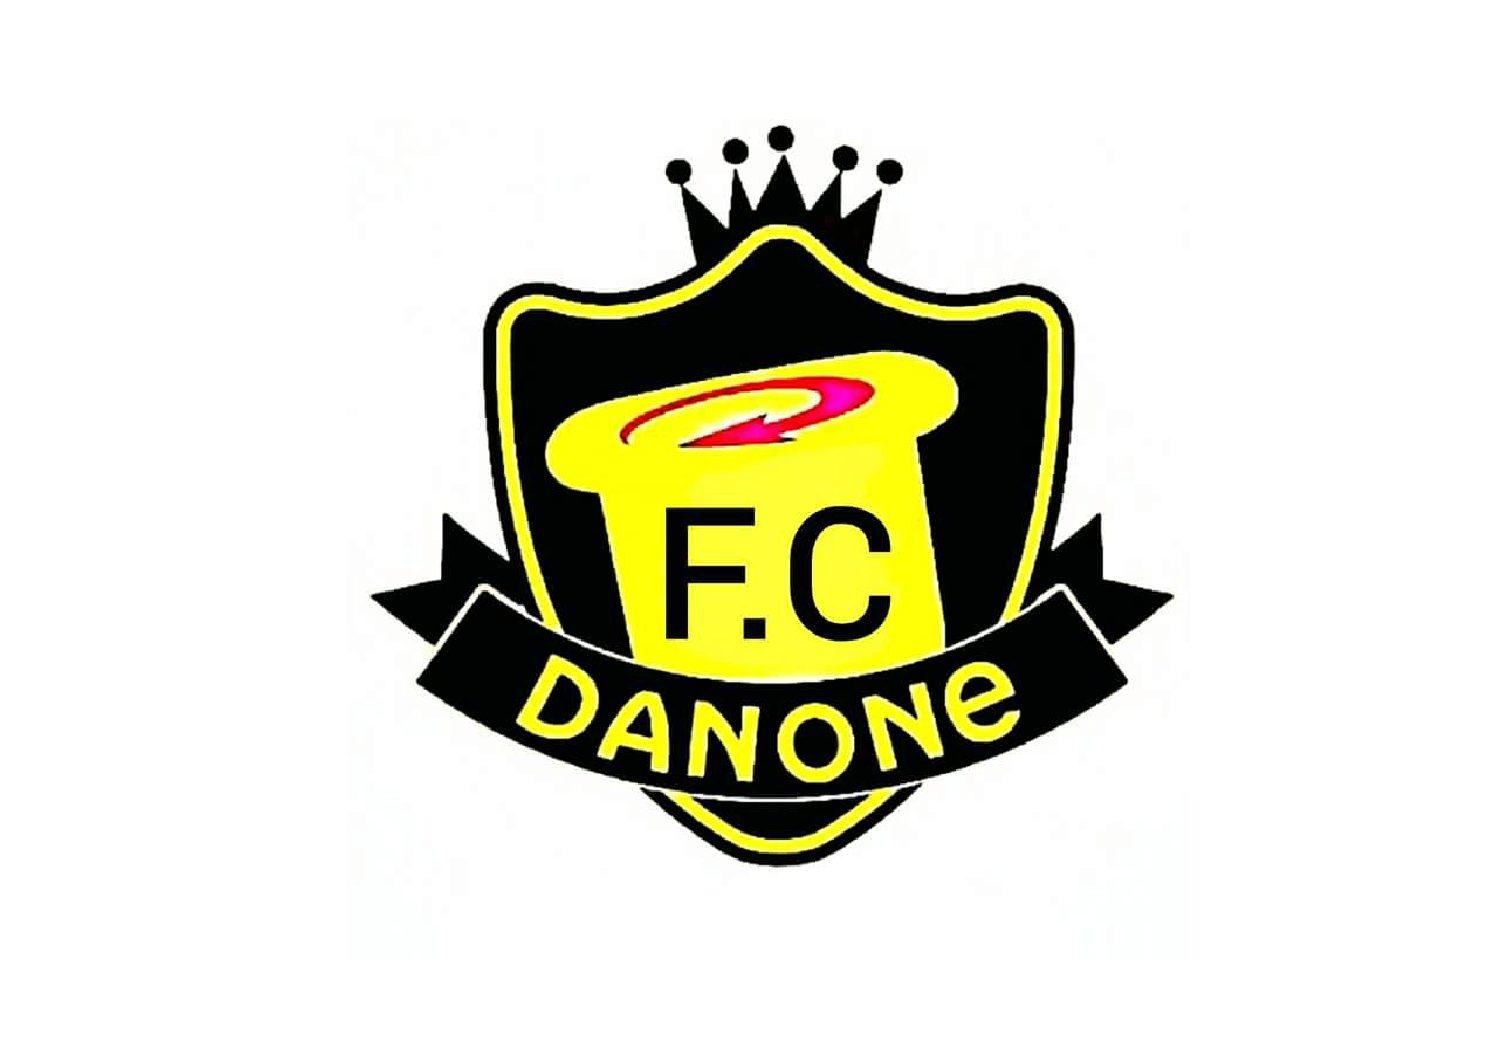 DANONE F.C